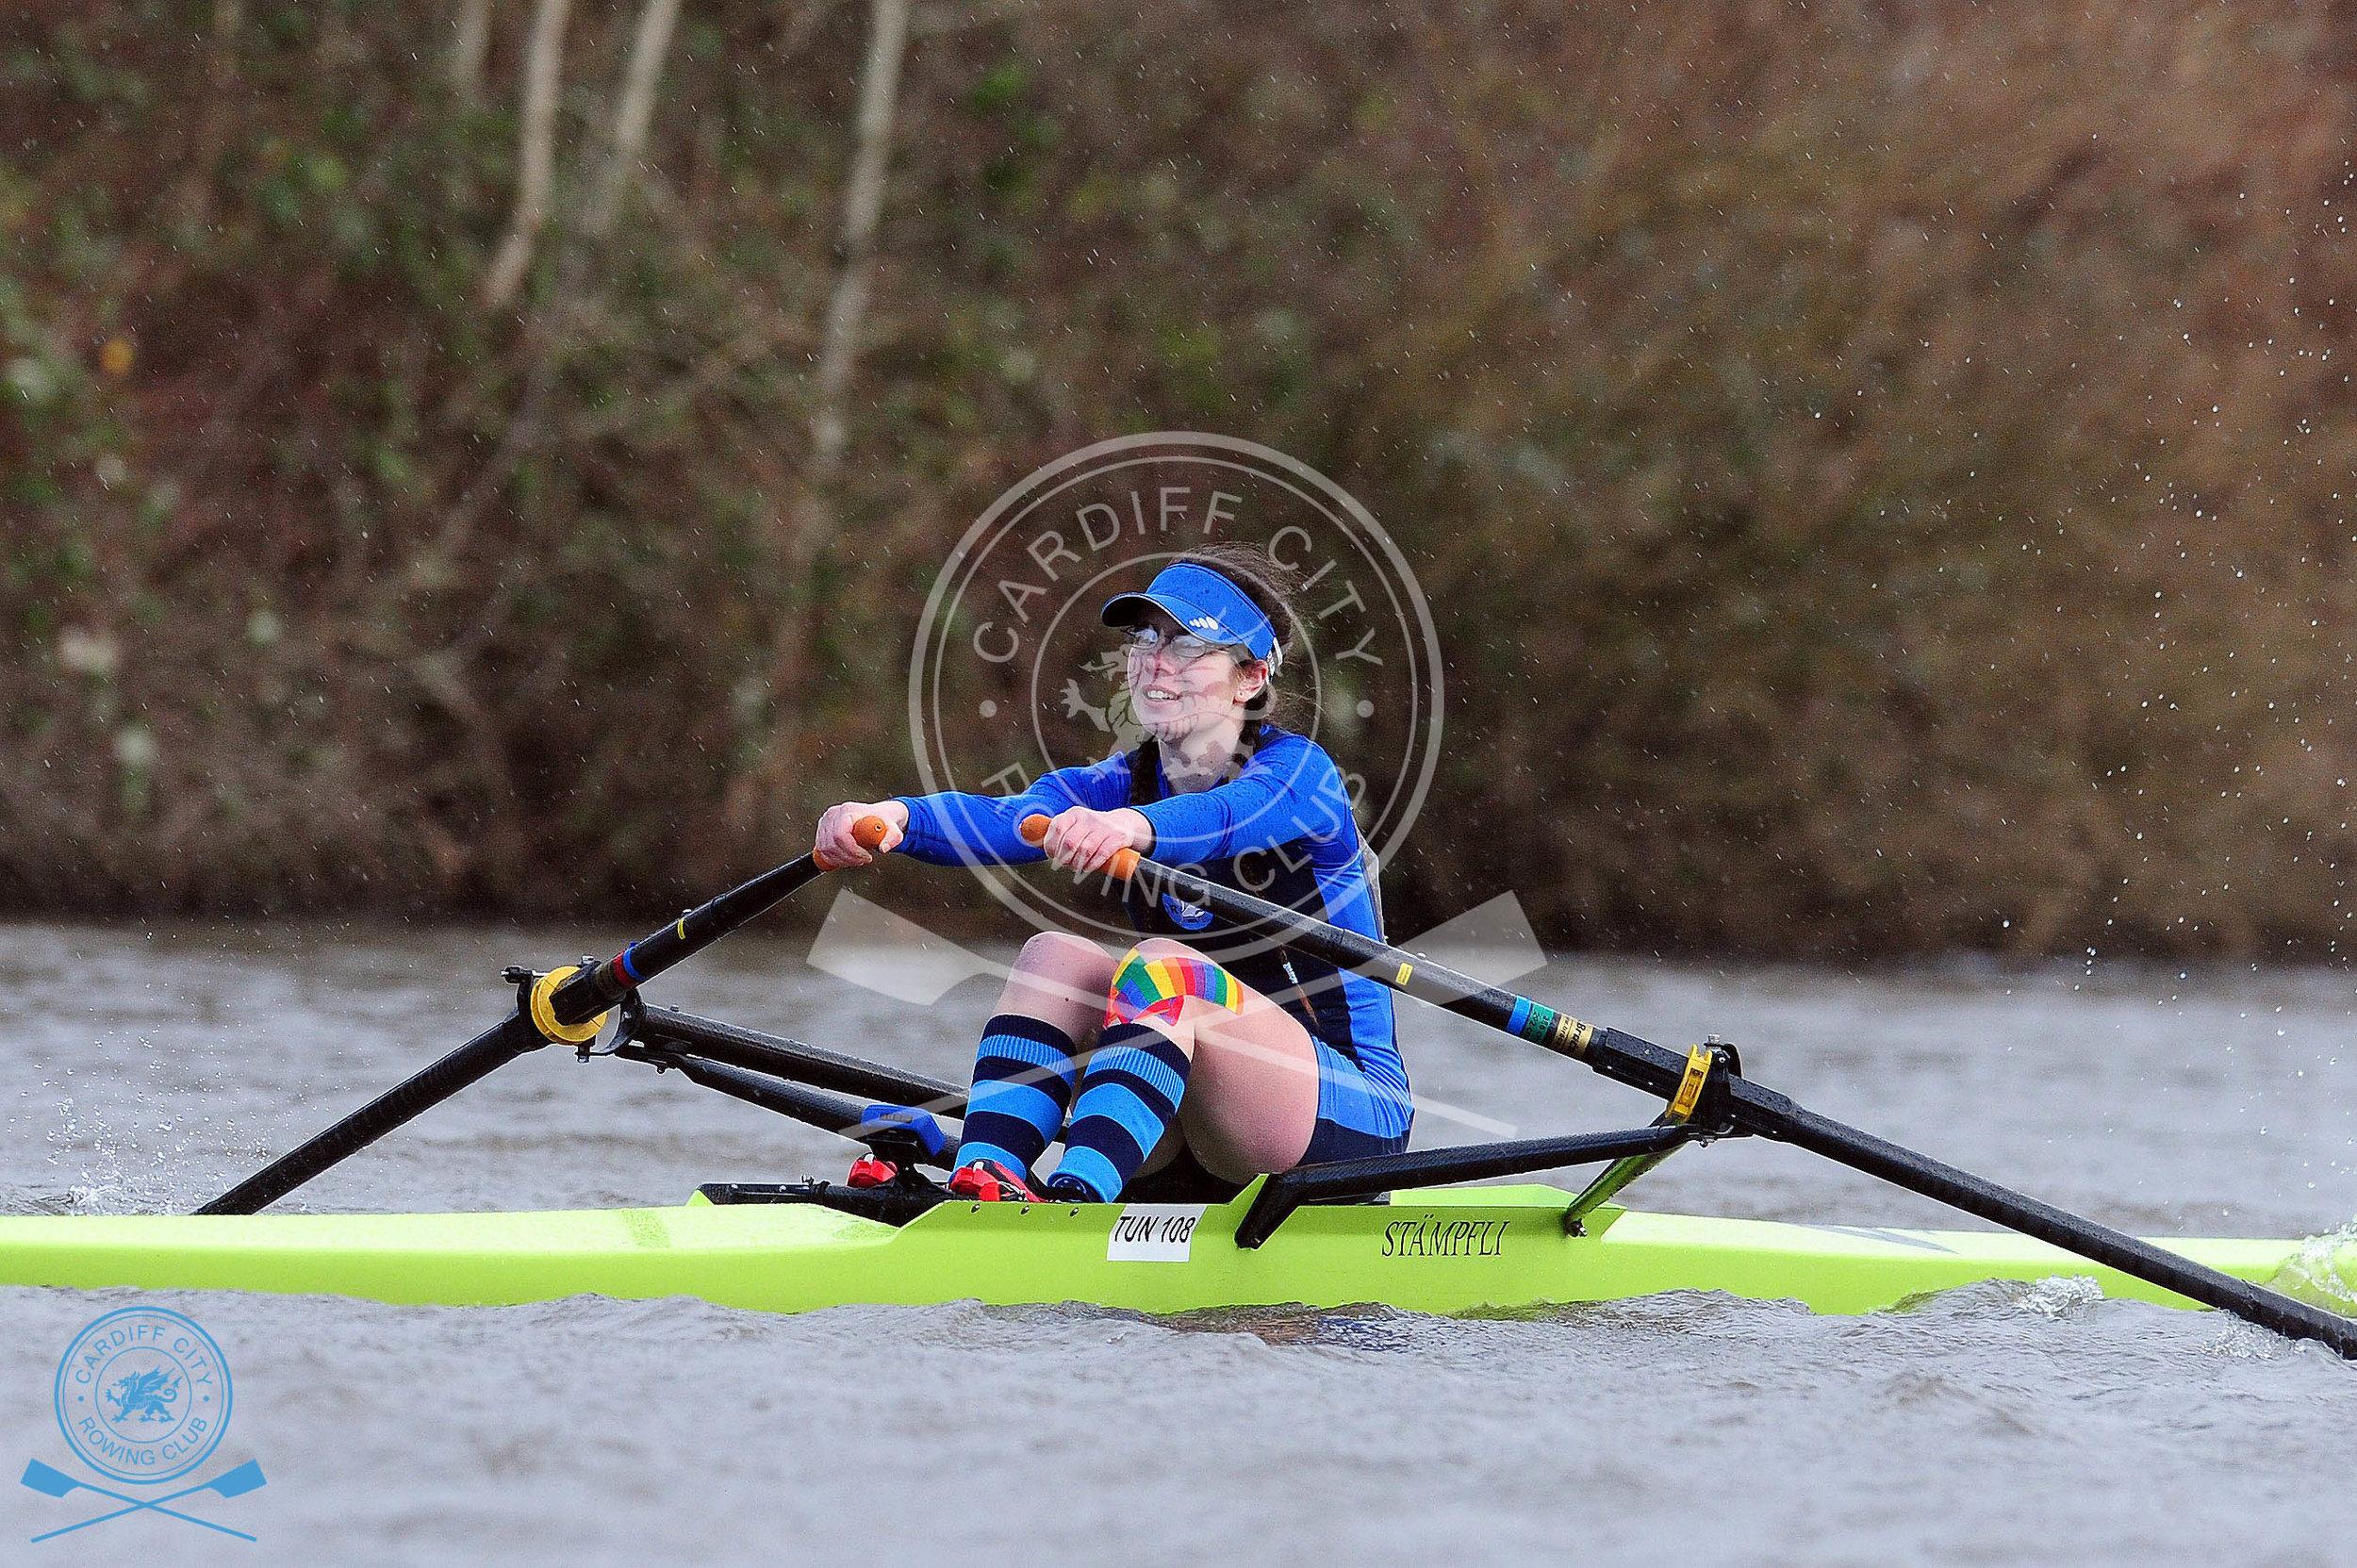 DW_280119_Cardiff_City_Rowing_307.jpg